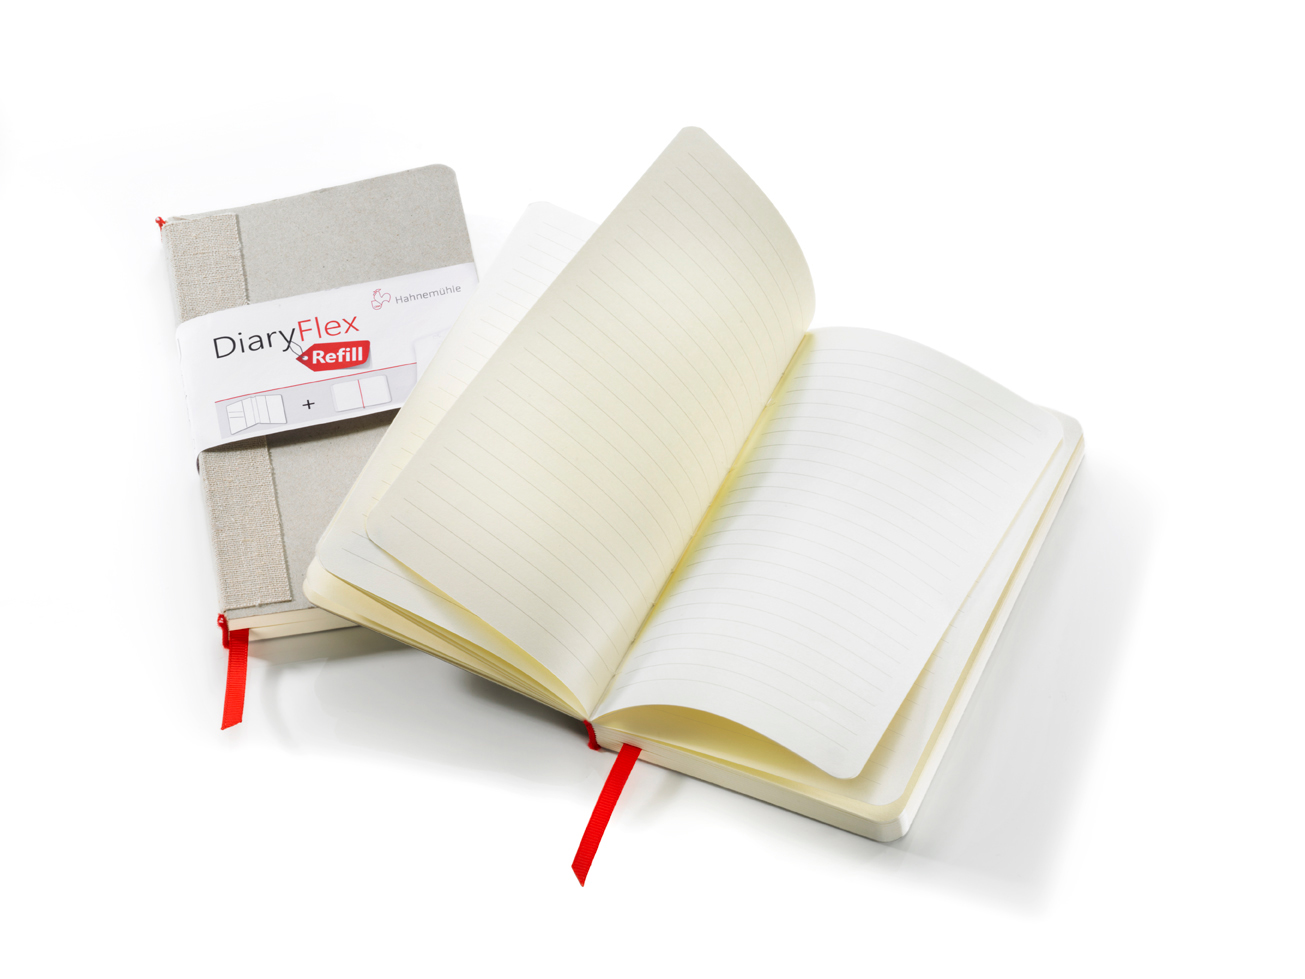 Hahnemühle - Diary Flex Insert